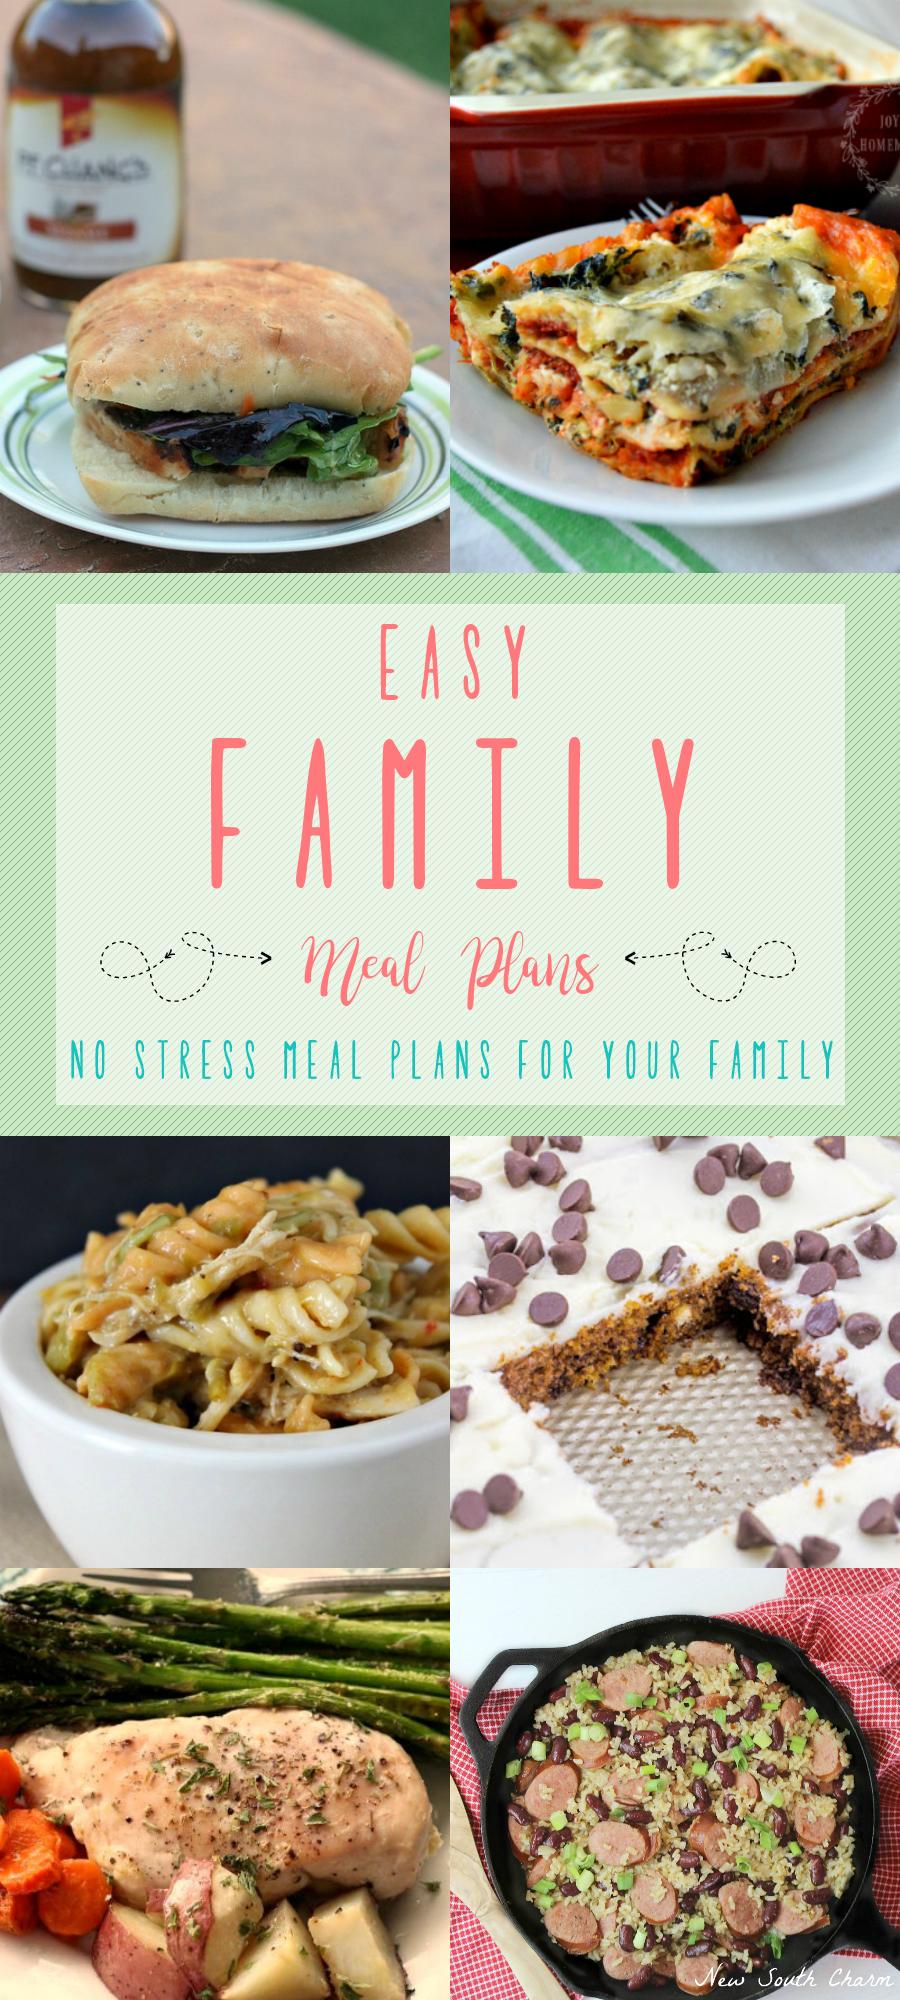 Easy Dinner Ideas for Your Family - Tastefully Eclectic